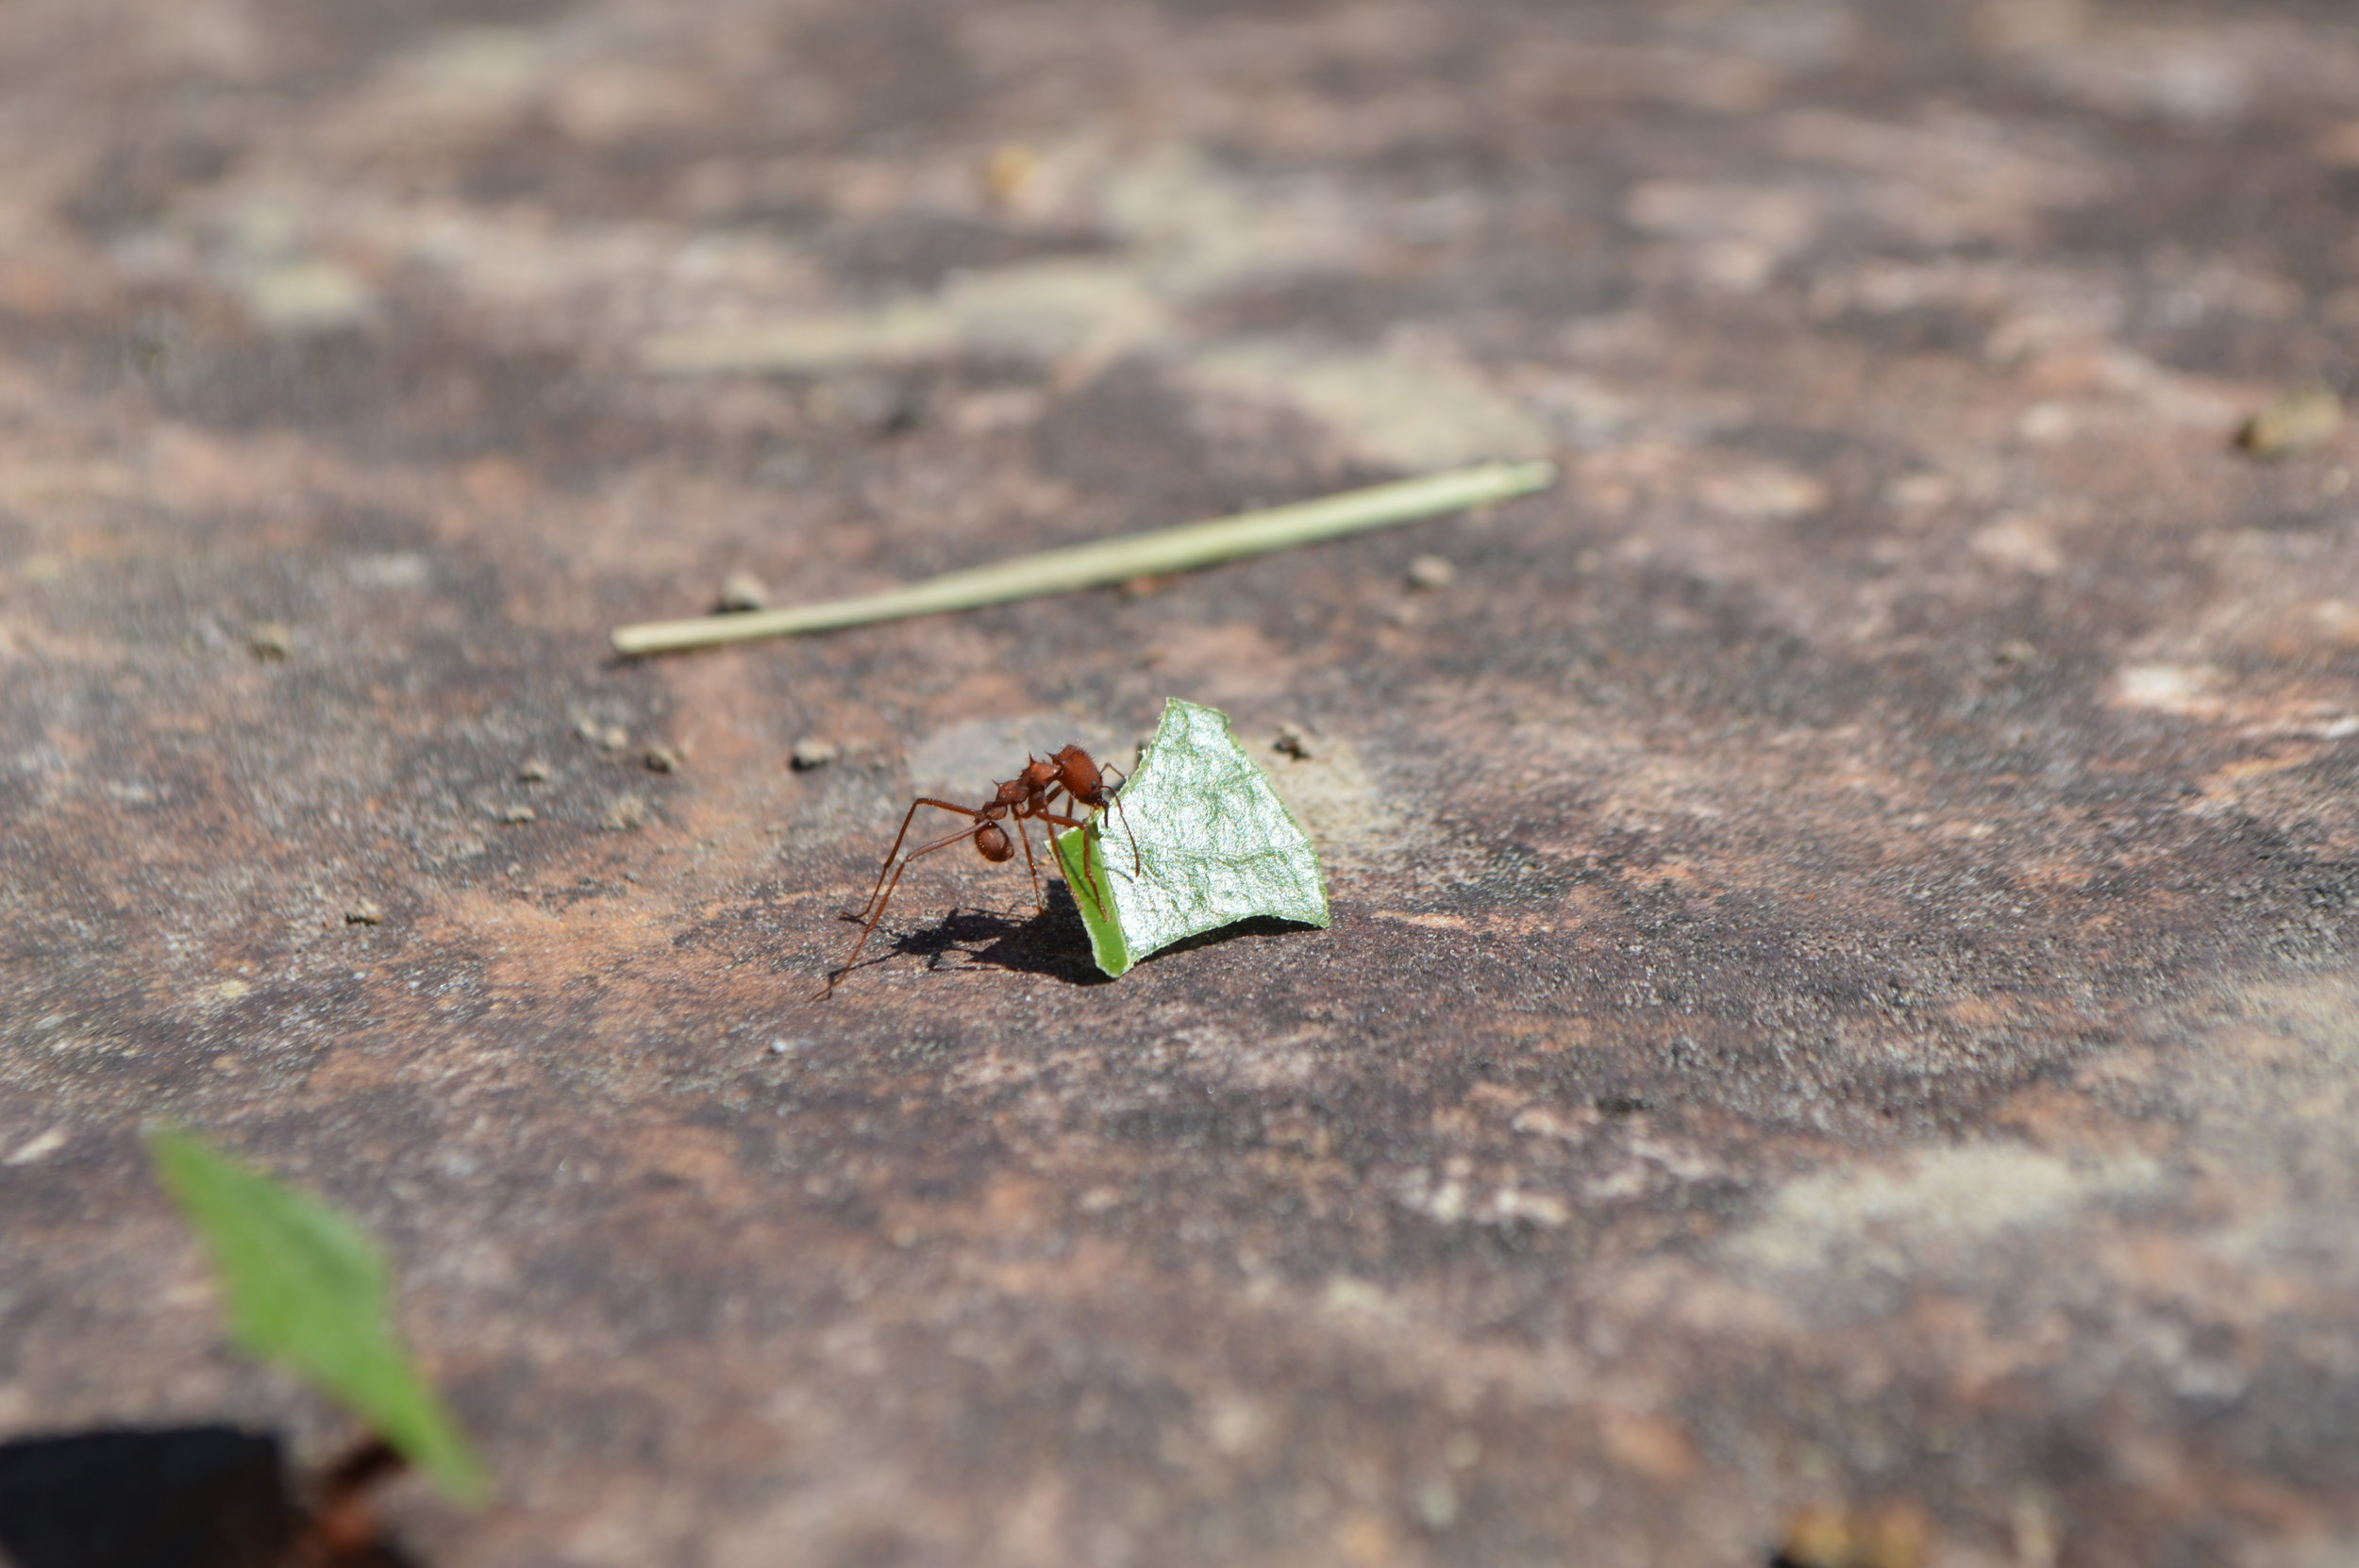 Leaf-cutter ants hard at work